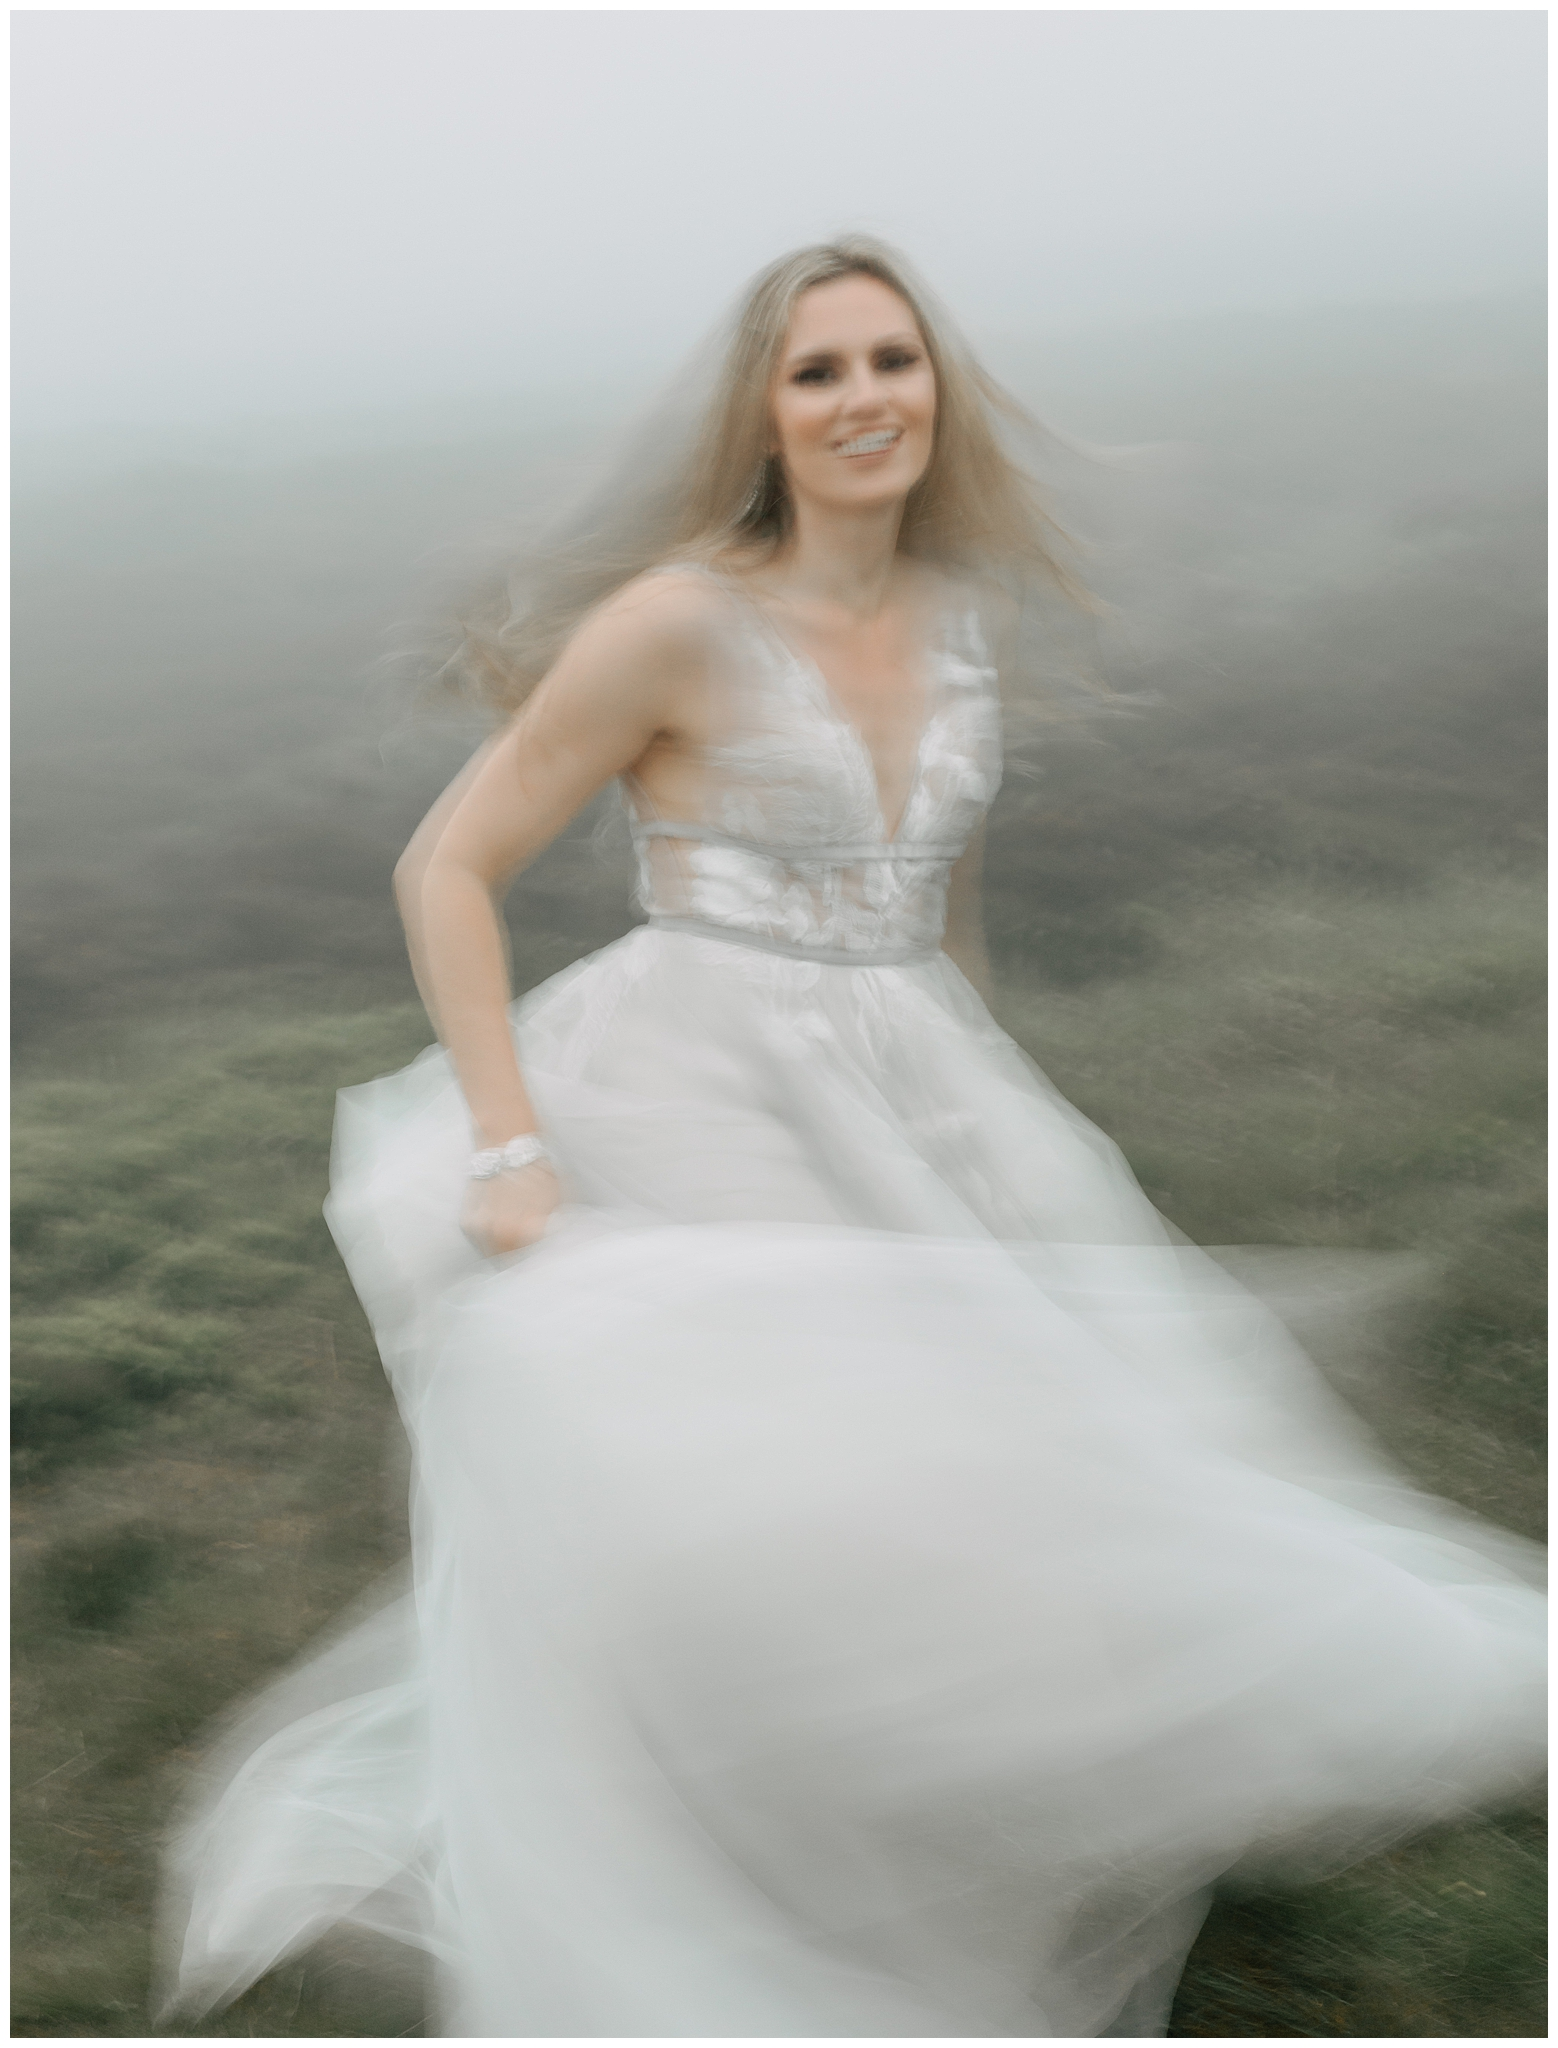 austin-texas-scottish-wedding-bride-groom22020.JPG